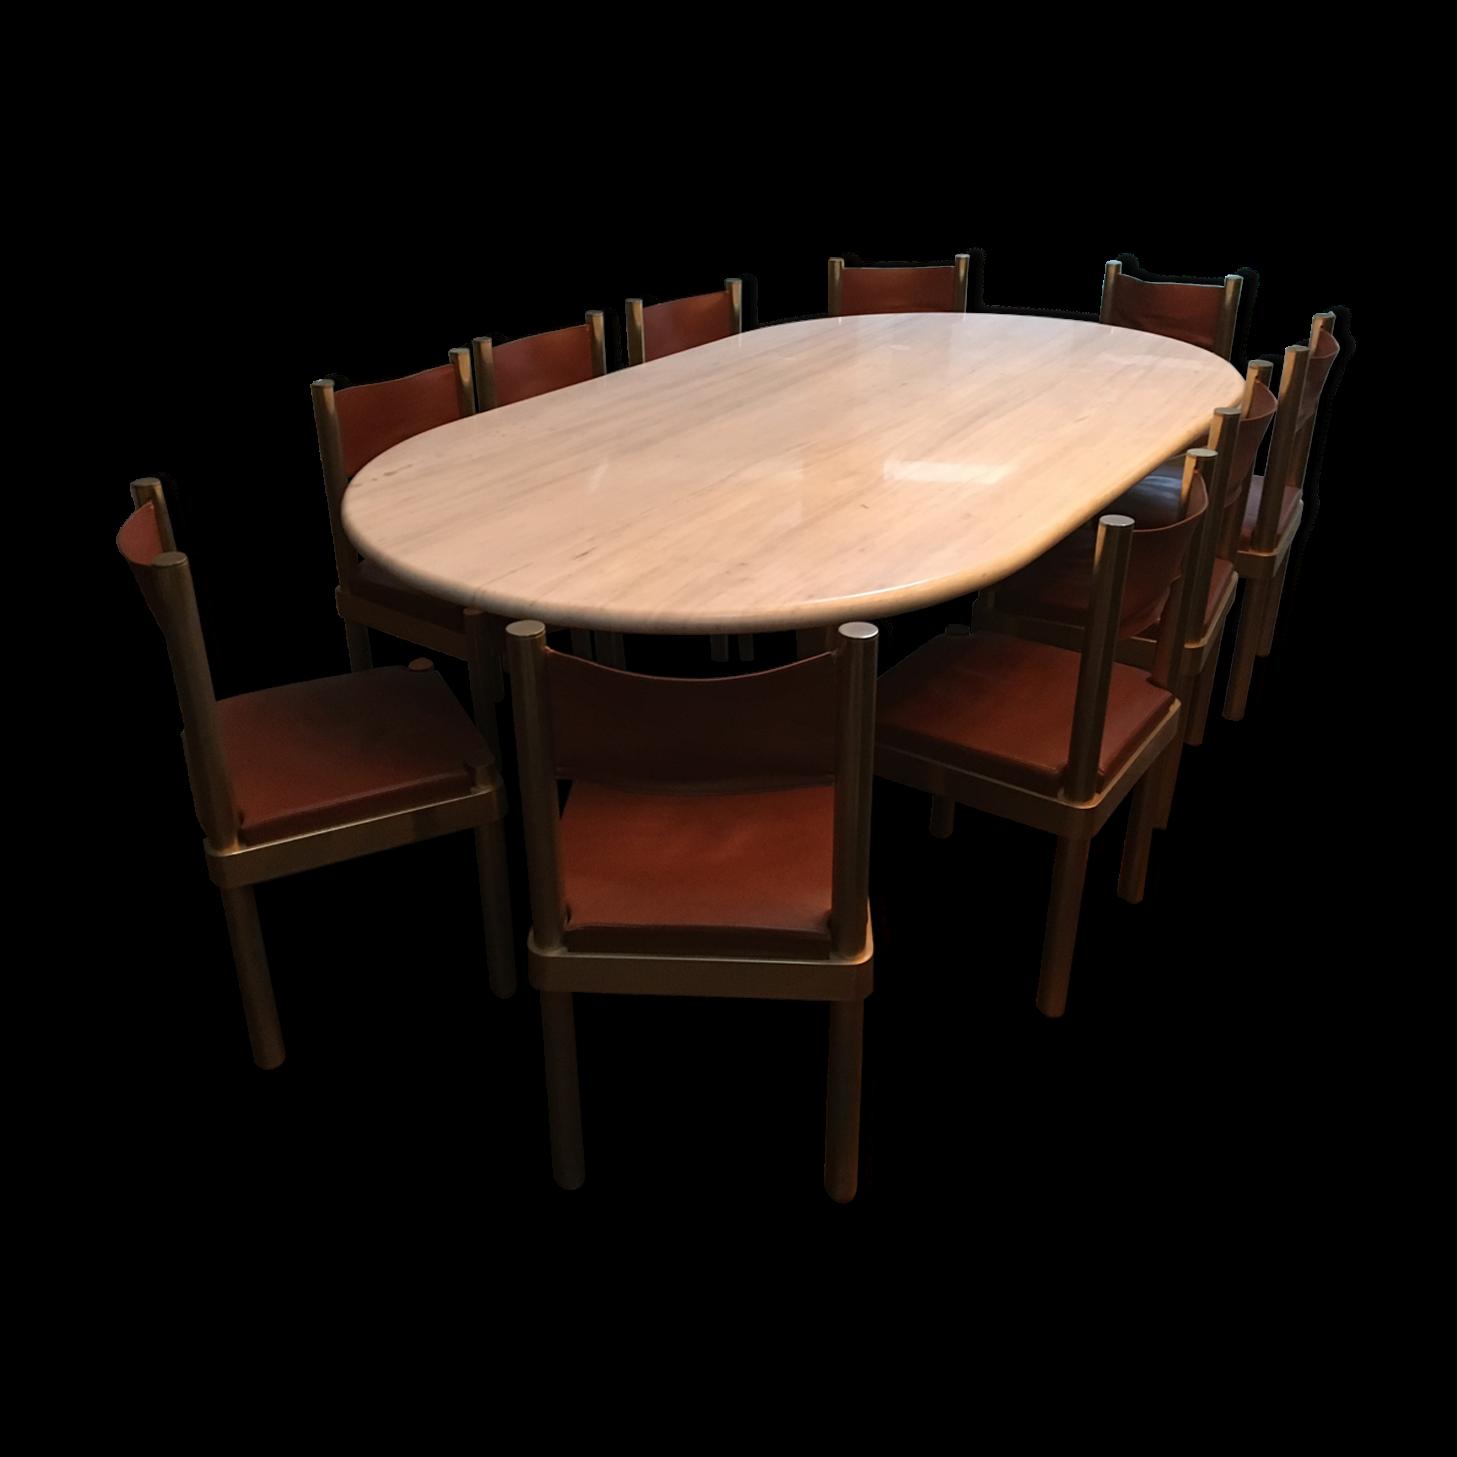 Table ovale marbre design stunning table knoll ronde - Table ovale marbre design ...